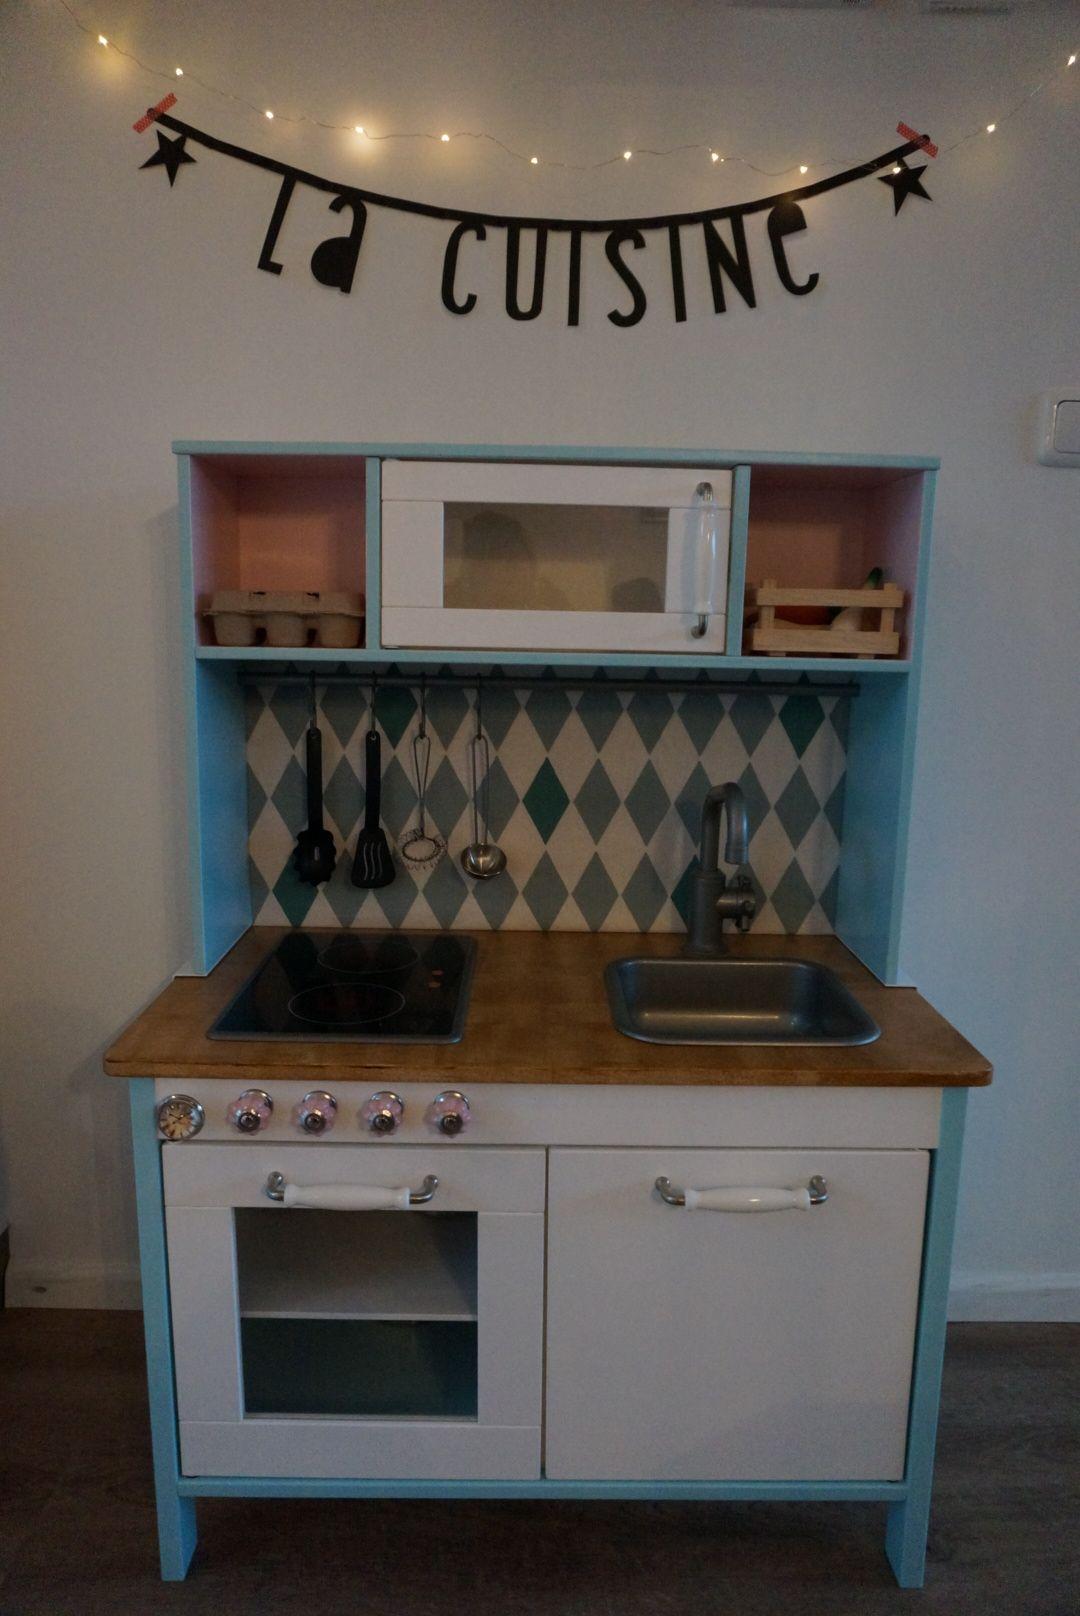 Extremely Ikea keukentje pimpen, la cuisine | Keukentje pimpen | Pinterest CF11